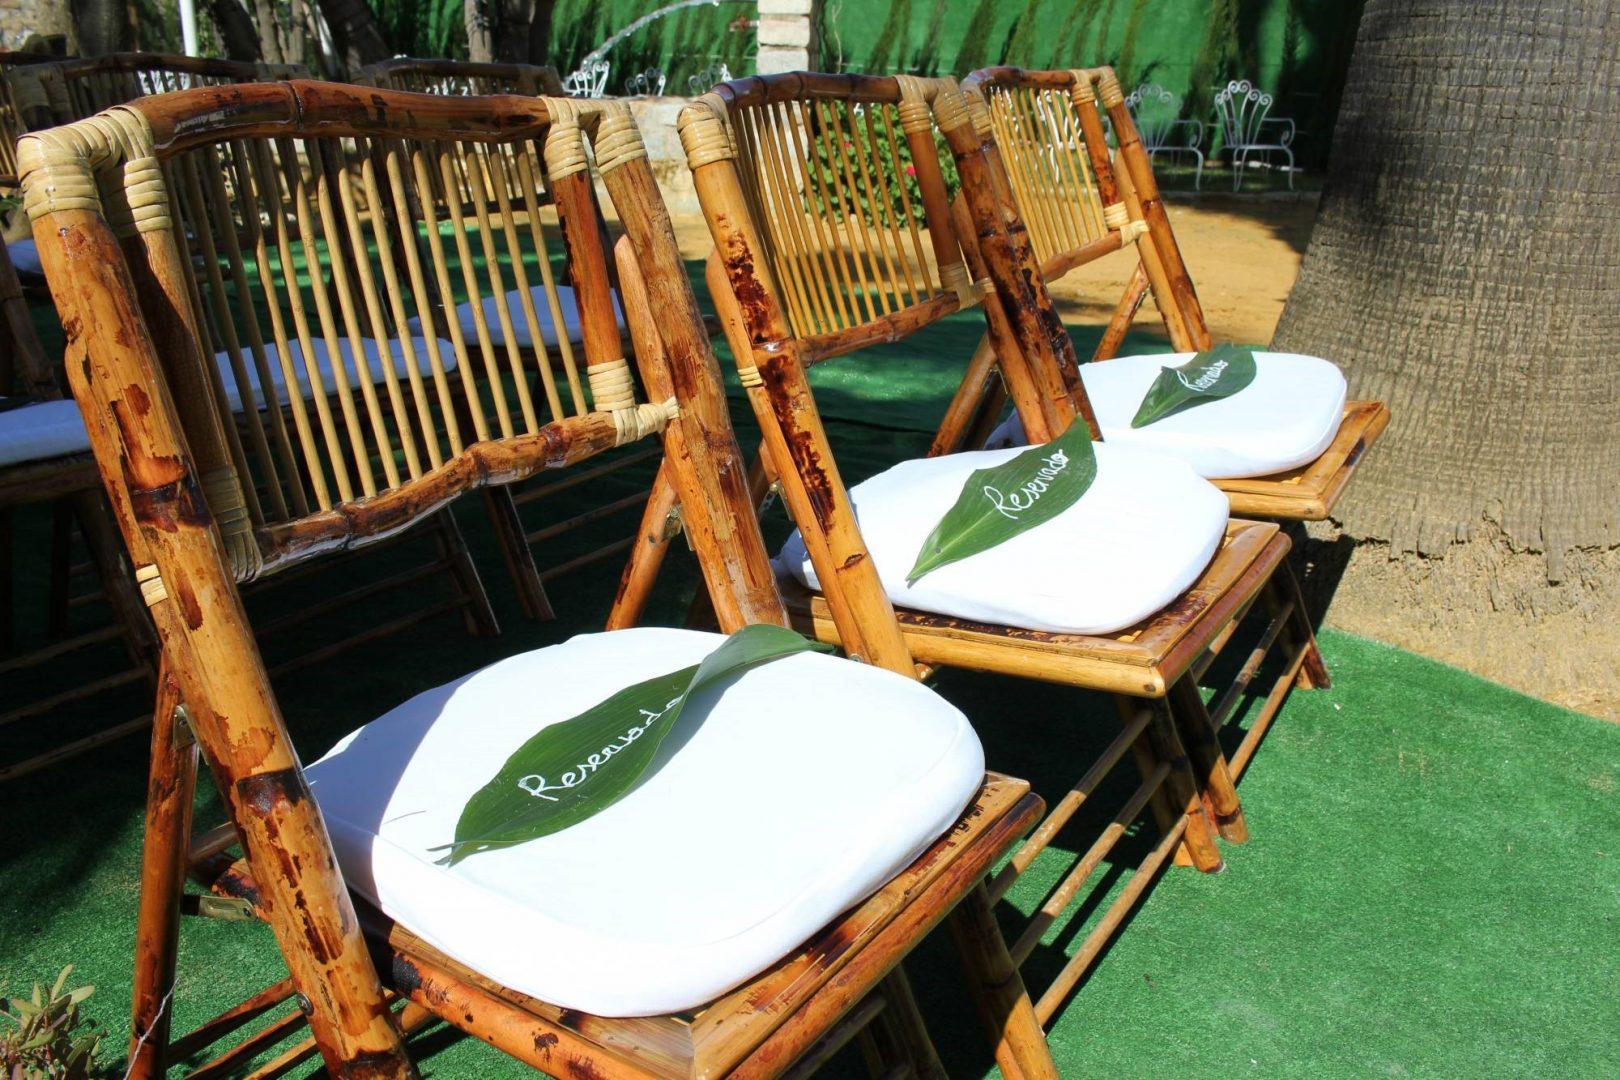 detalles verdes en sillas